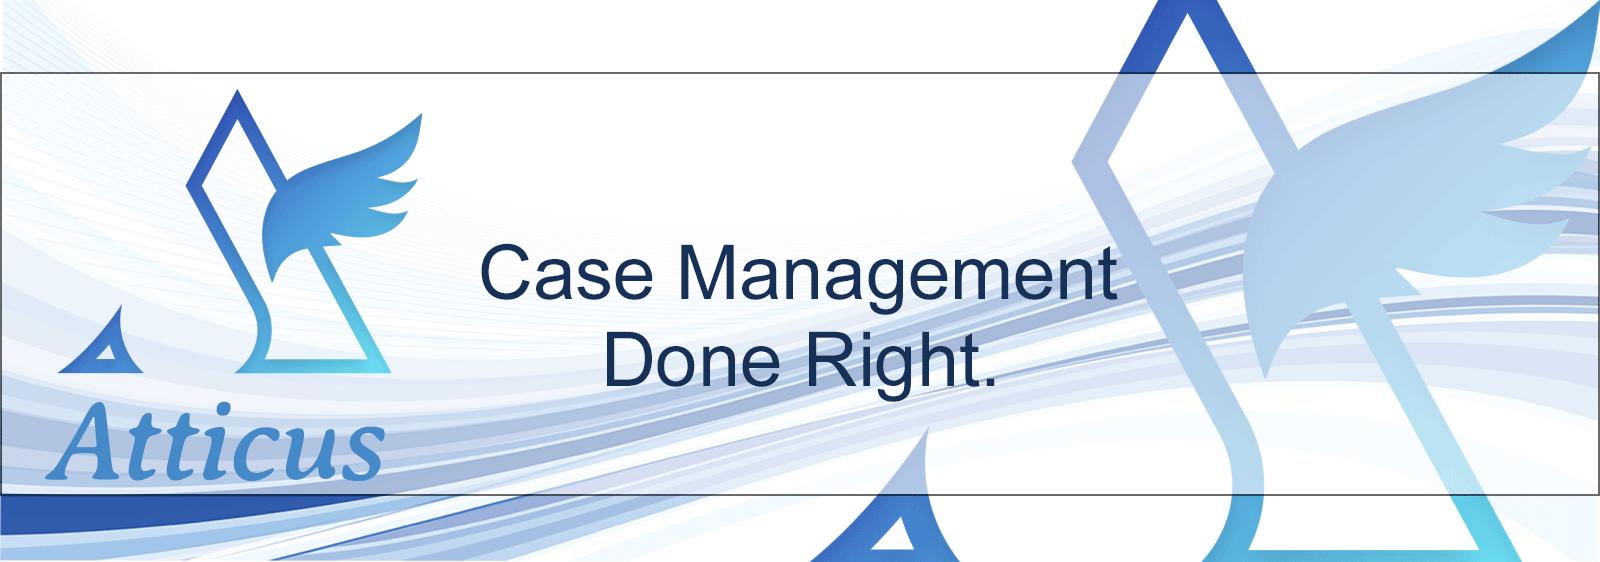 Atticus Case Management System - Case Management Done Right